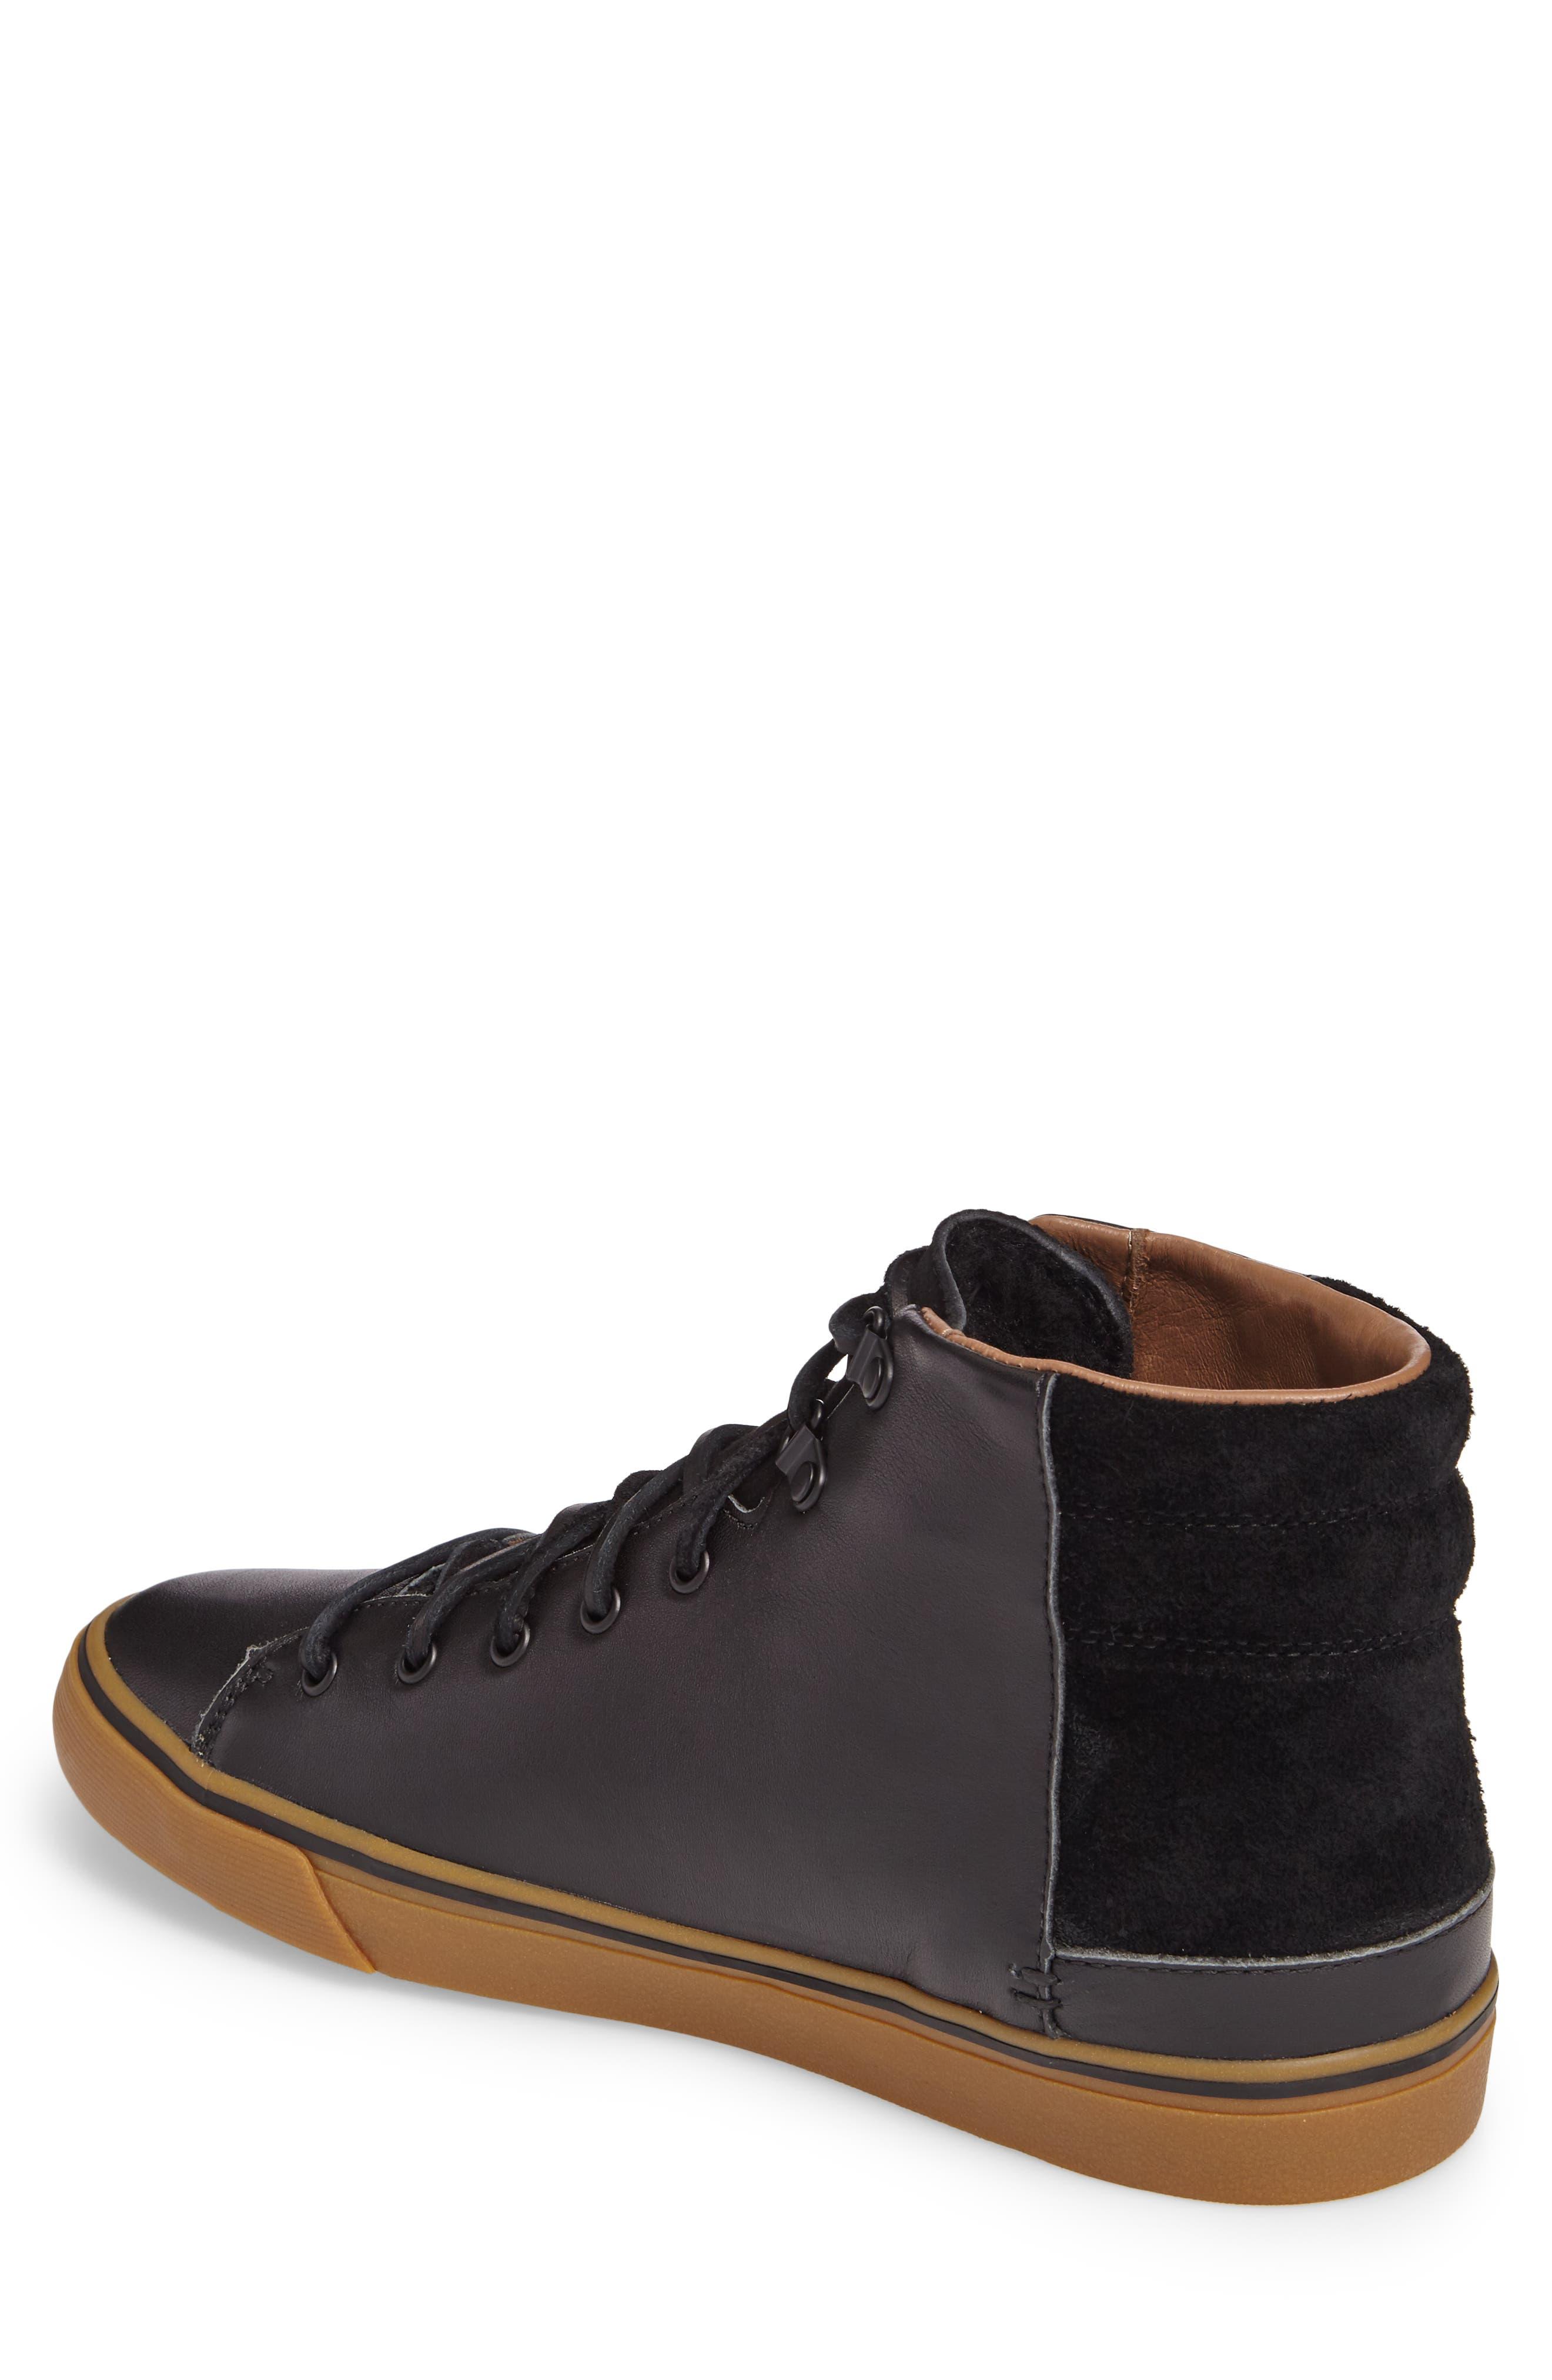 Alternate Image 2  - UGG® Hoyt Luxe Genuine Shearling High Top Sneaker (Men)